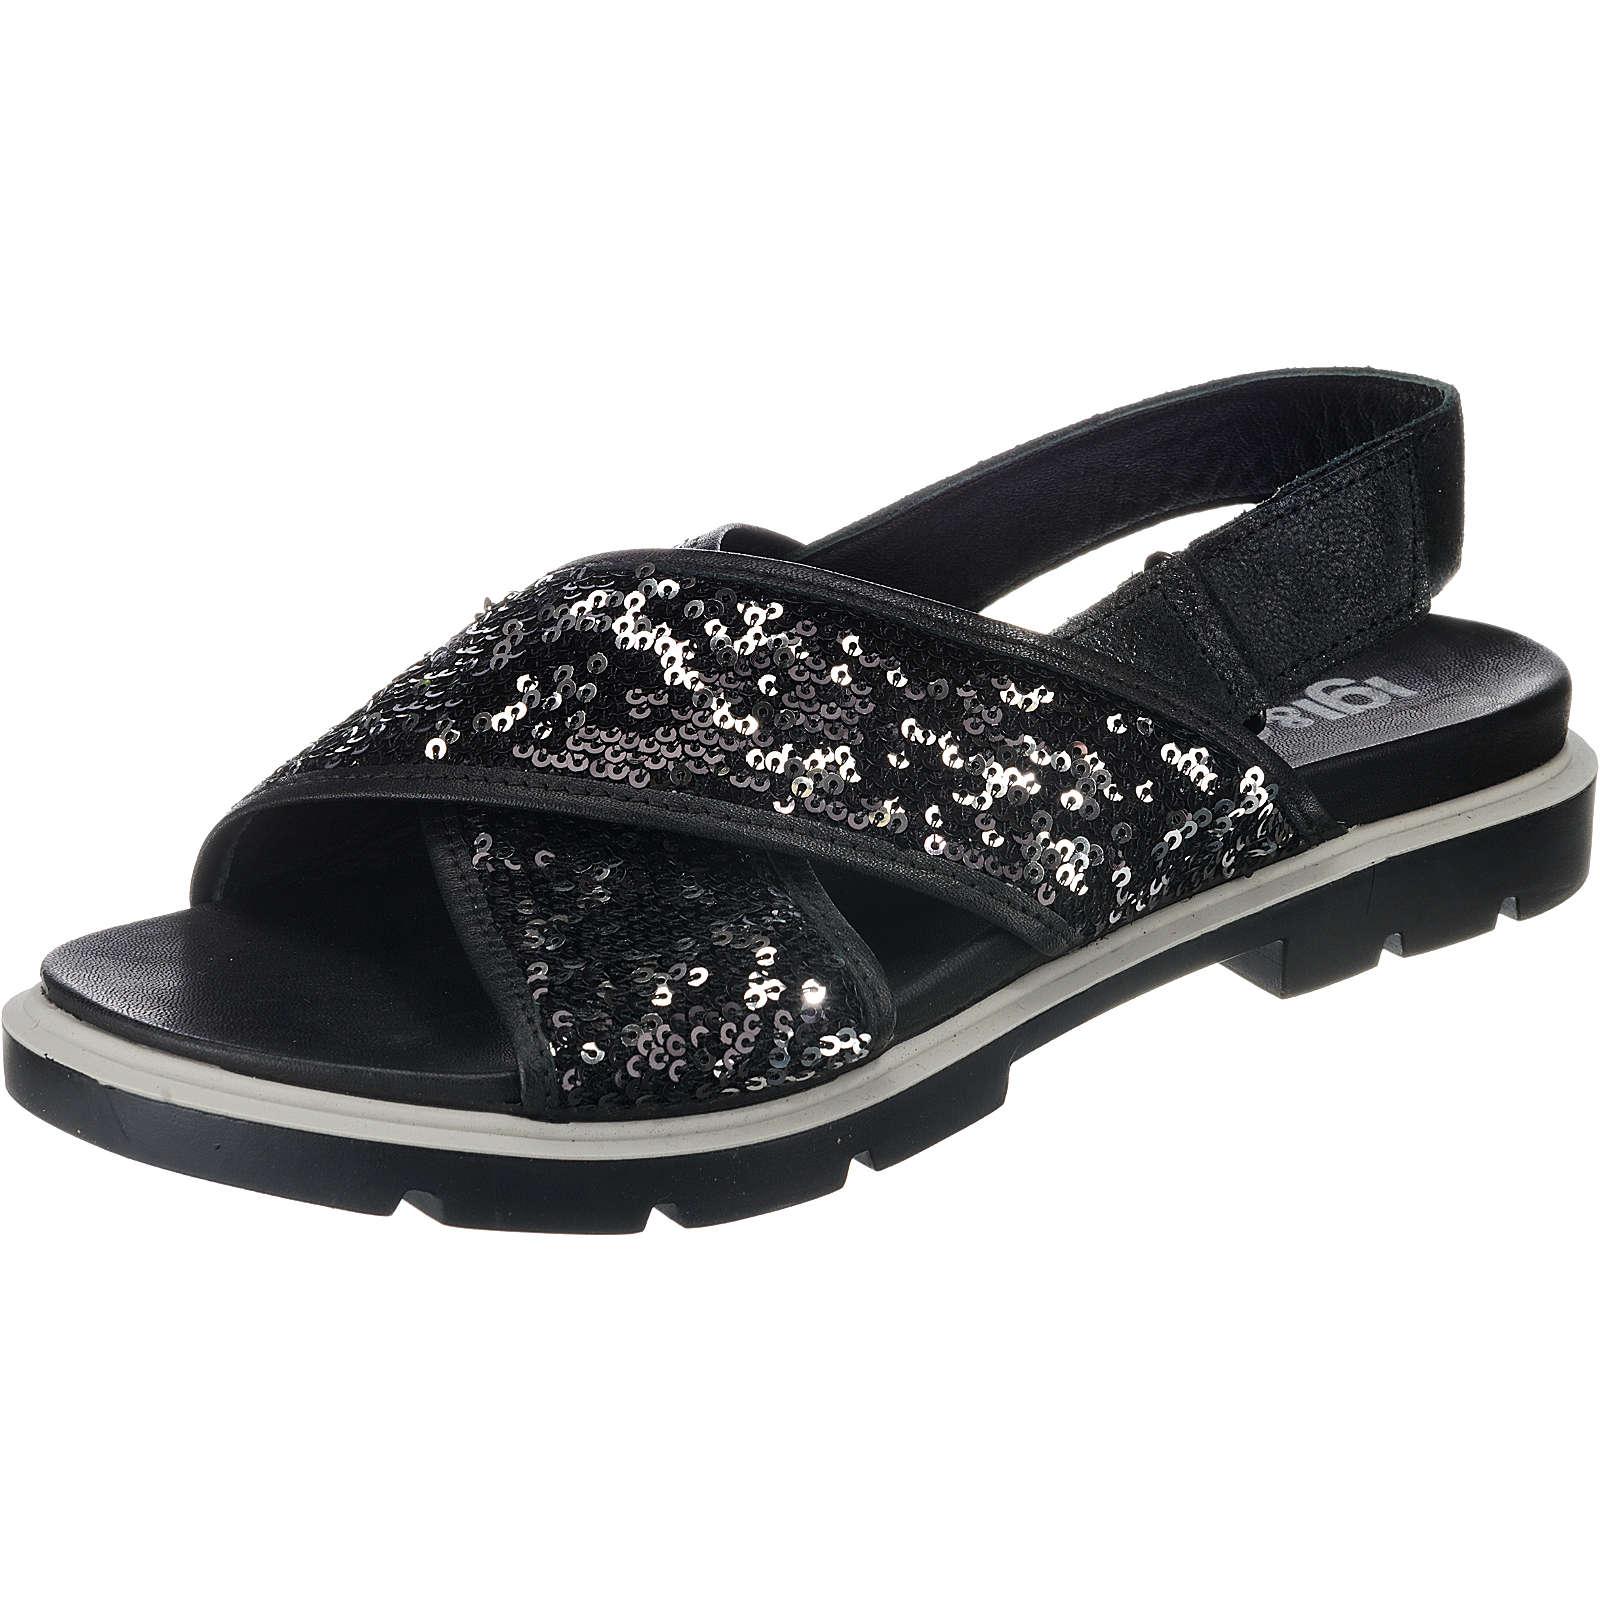 IGI & CO DSR 11698 Klassische Sandaletten schwarz Damen Gr. 37